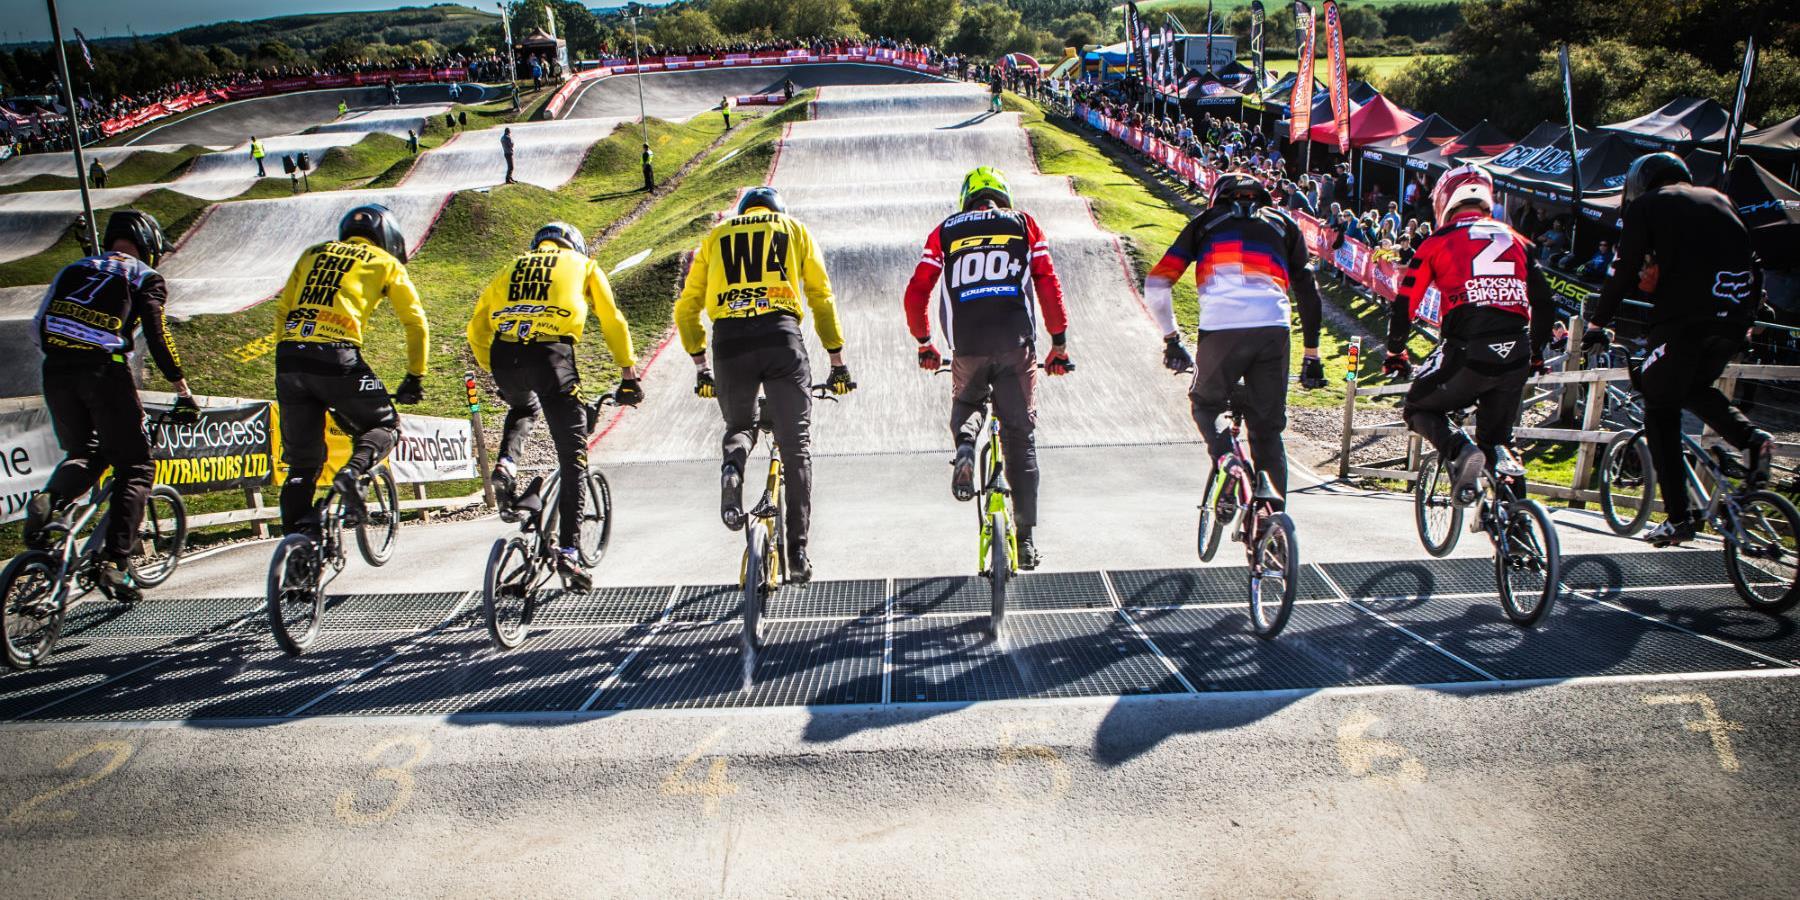 bmx, bmx racing, leicester bmx, Olympics, british cycling, leicester huncote hornets